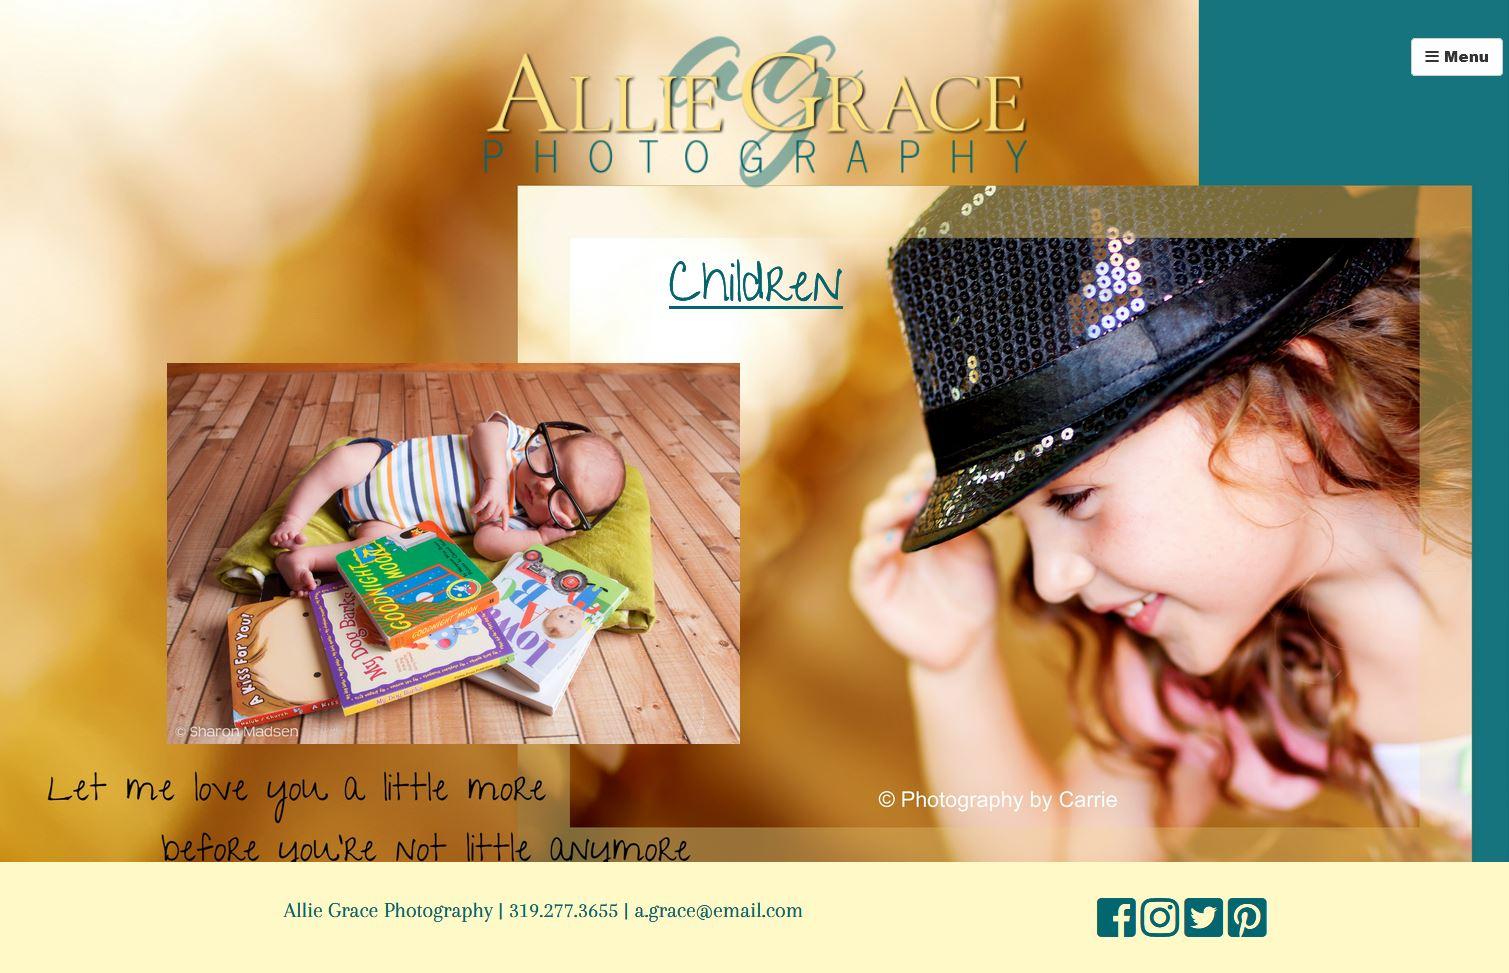 003_Child Gallery